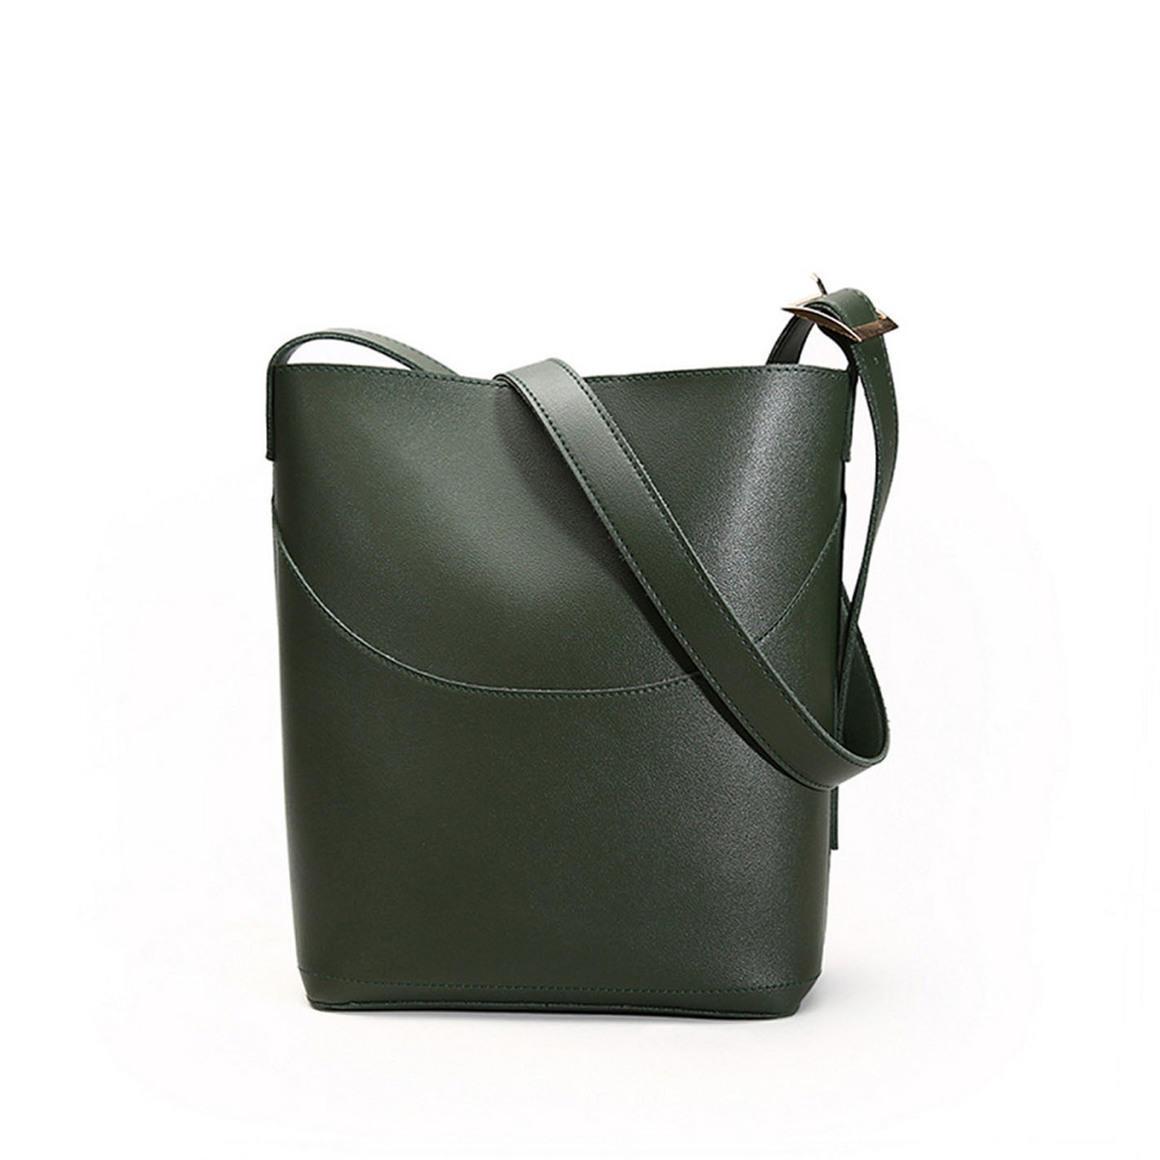 THSB1014: Olive:  Eva Bucket Tote Bag | Trada Marketplace